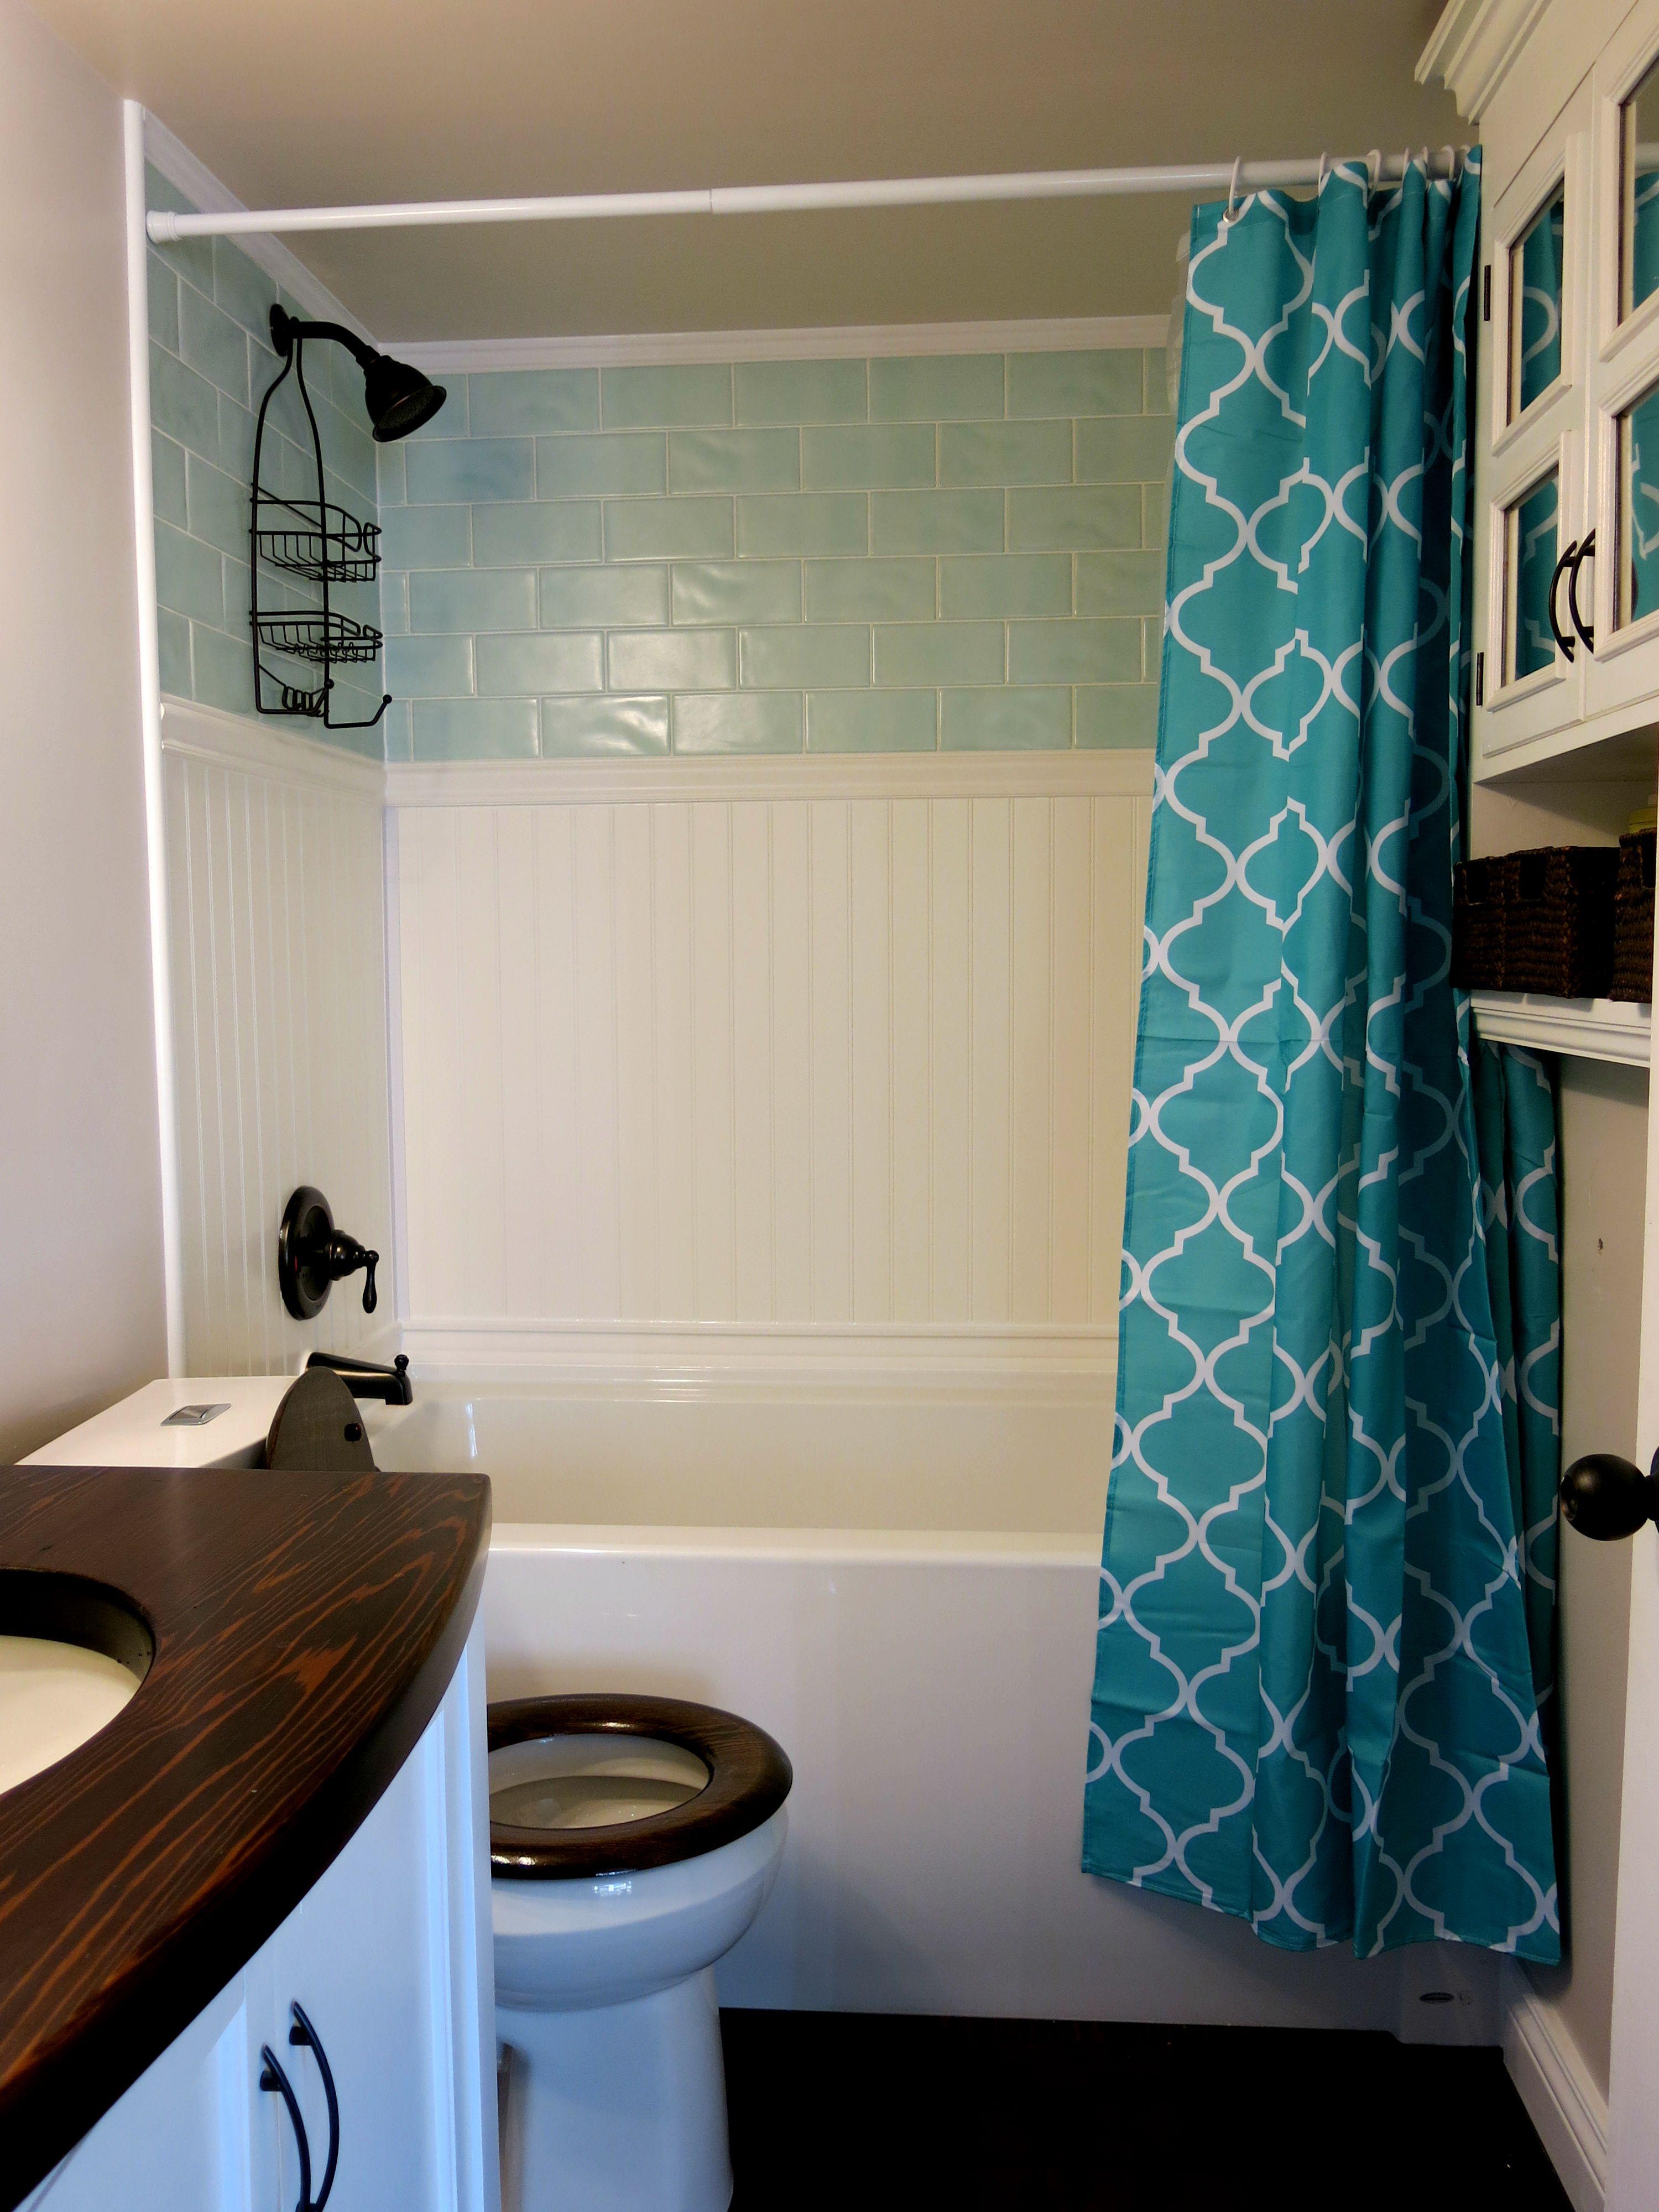 Home polymax pvc beadboard planks 1 4 quot x 6 quot x 30 quot 3 pk reversible - Pvc Wainscoting Plastpro Vinyl Planking Plastic Beadboard Shower Surround Wooden Varnished Toilet Seat